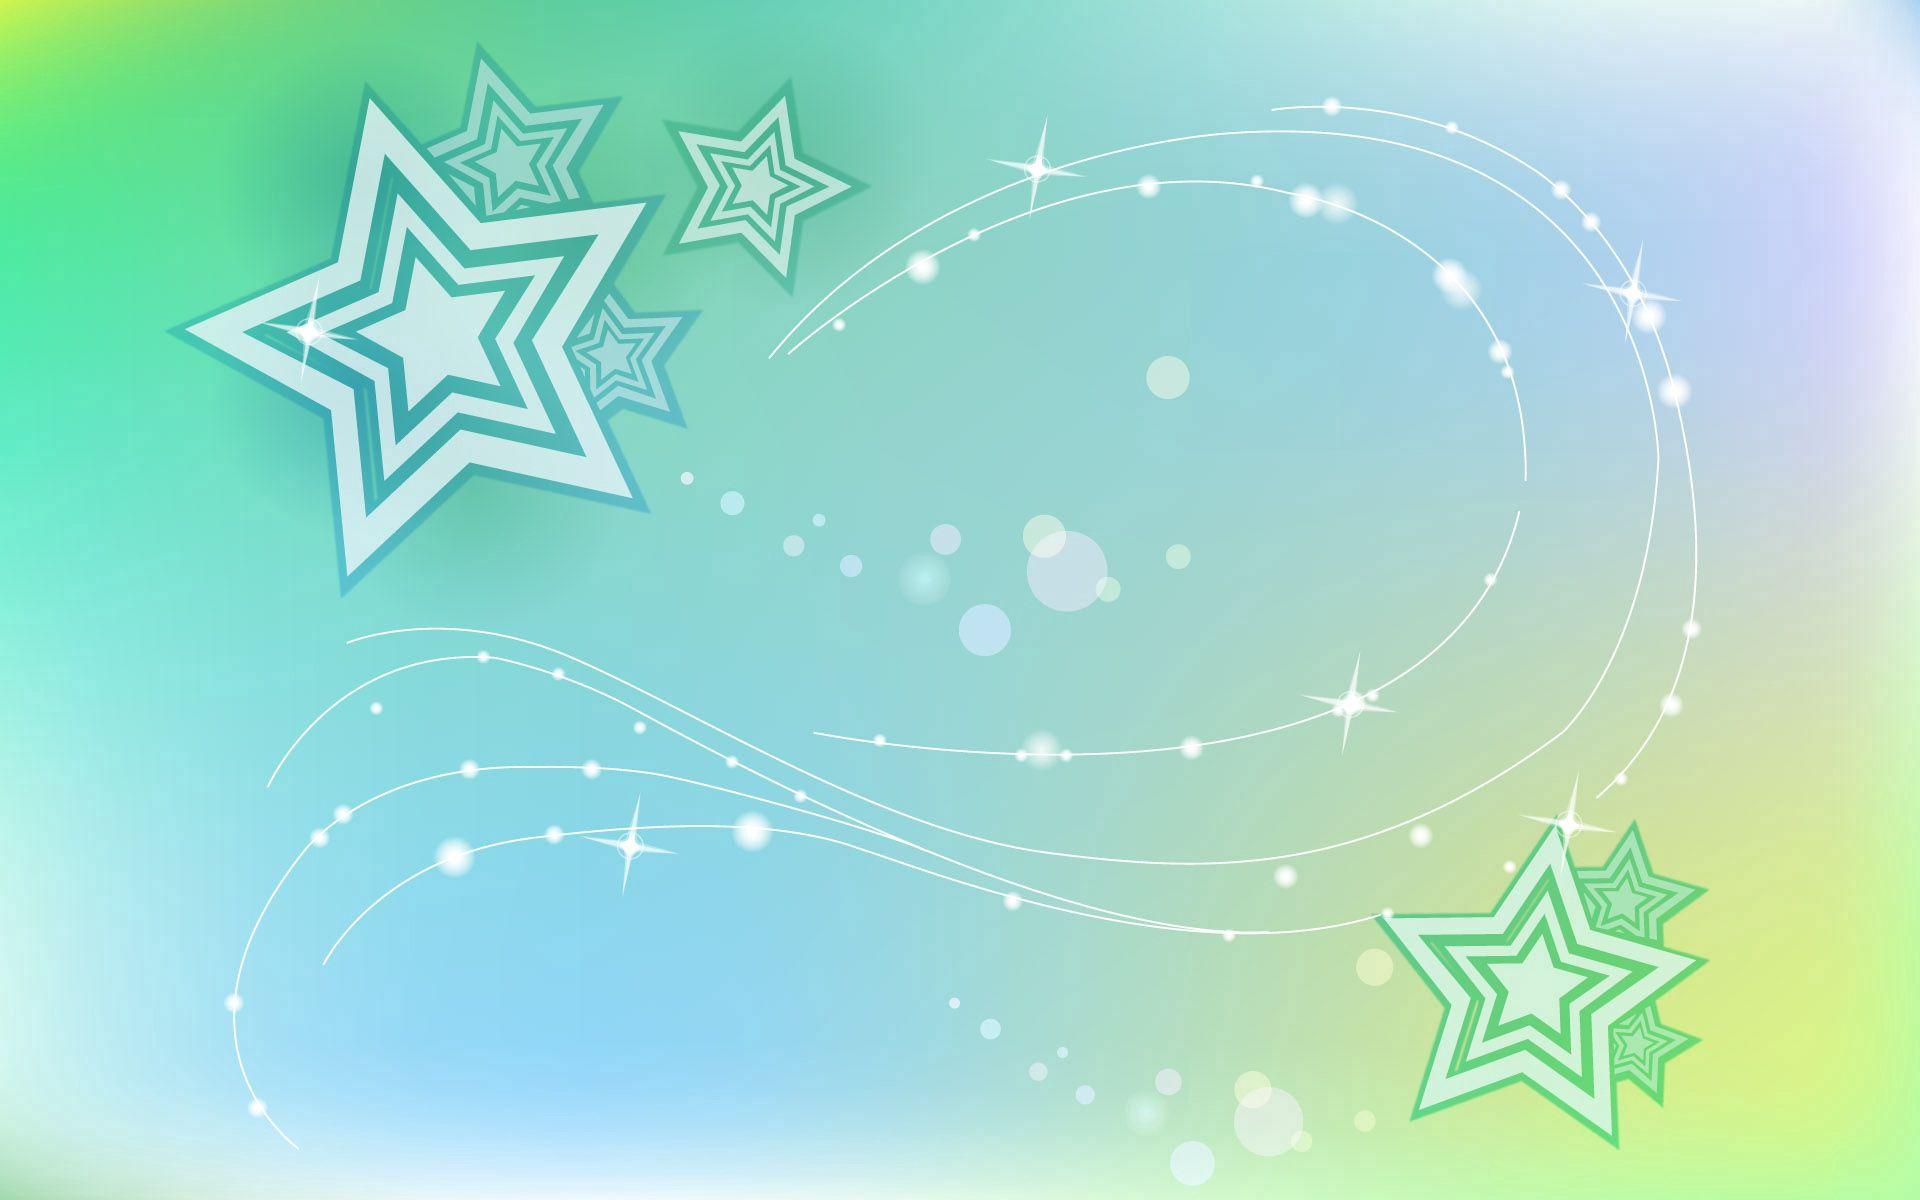 146929 descargar fondo de pantalla Abstracción, Líneas, Lineas, Fondo, De Color Claro, Luz, Figuritas, Figuras, Estrellas: protectores de pantalla e imágenes gratis